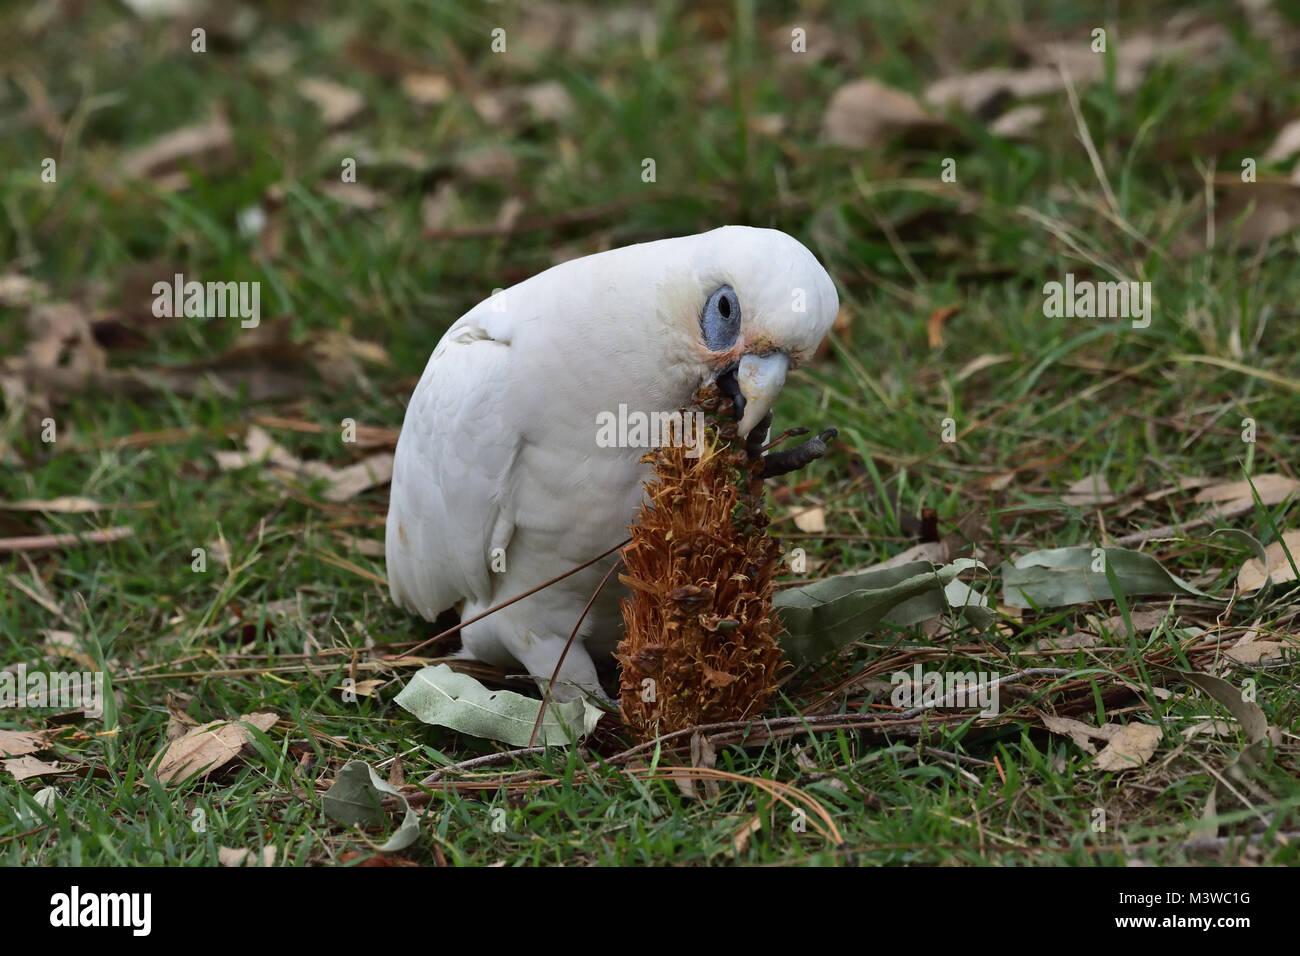 An Australian Little Corella eating a Pine Cone seed Stock Photo